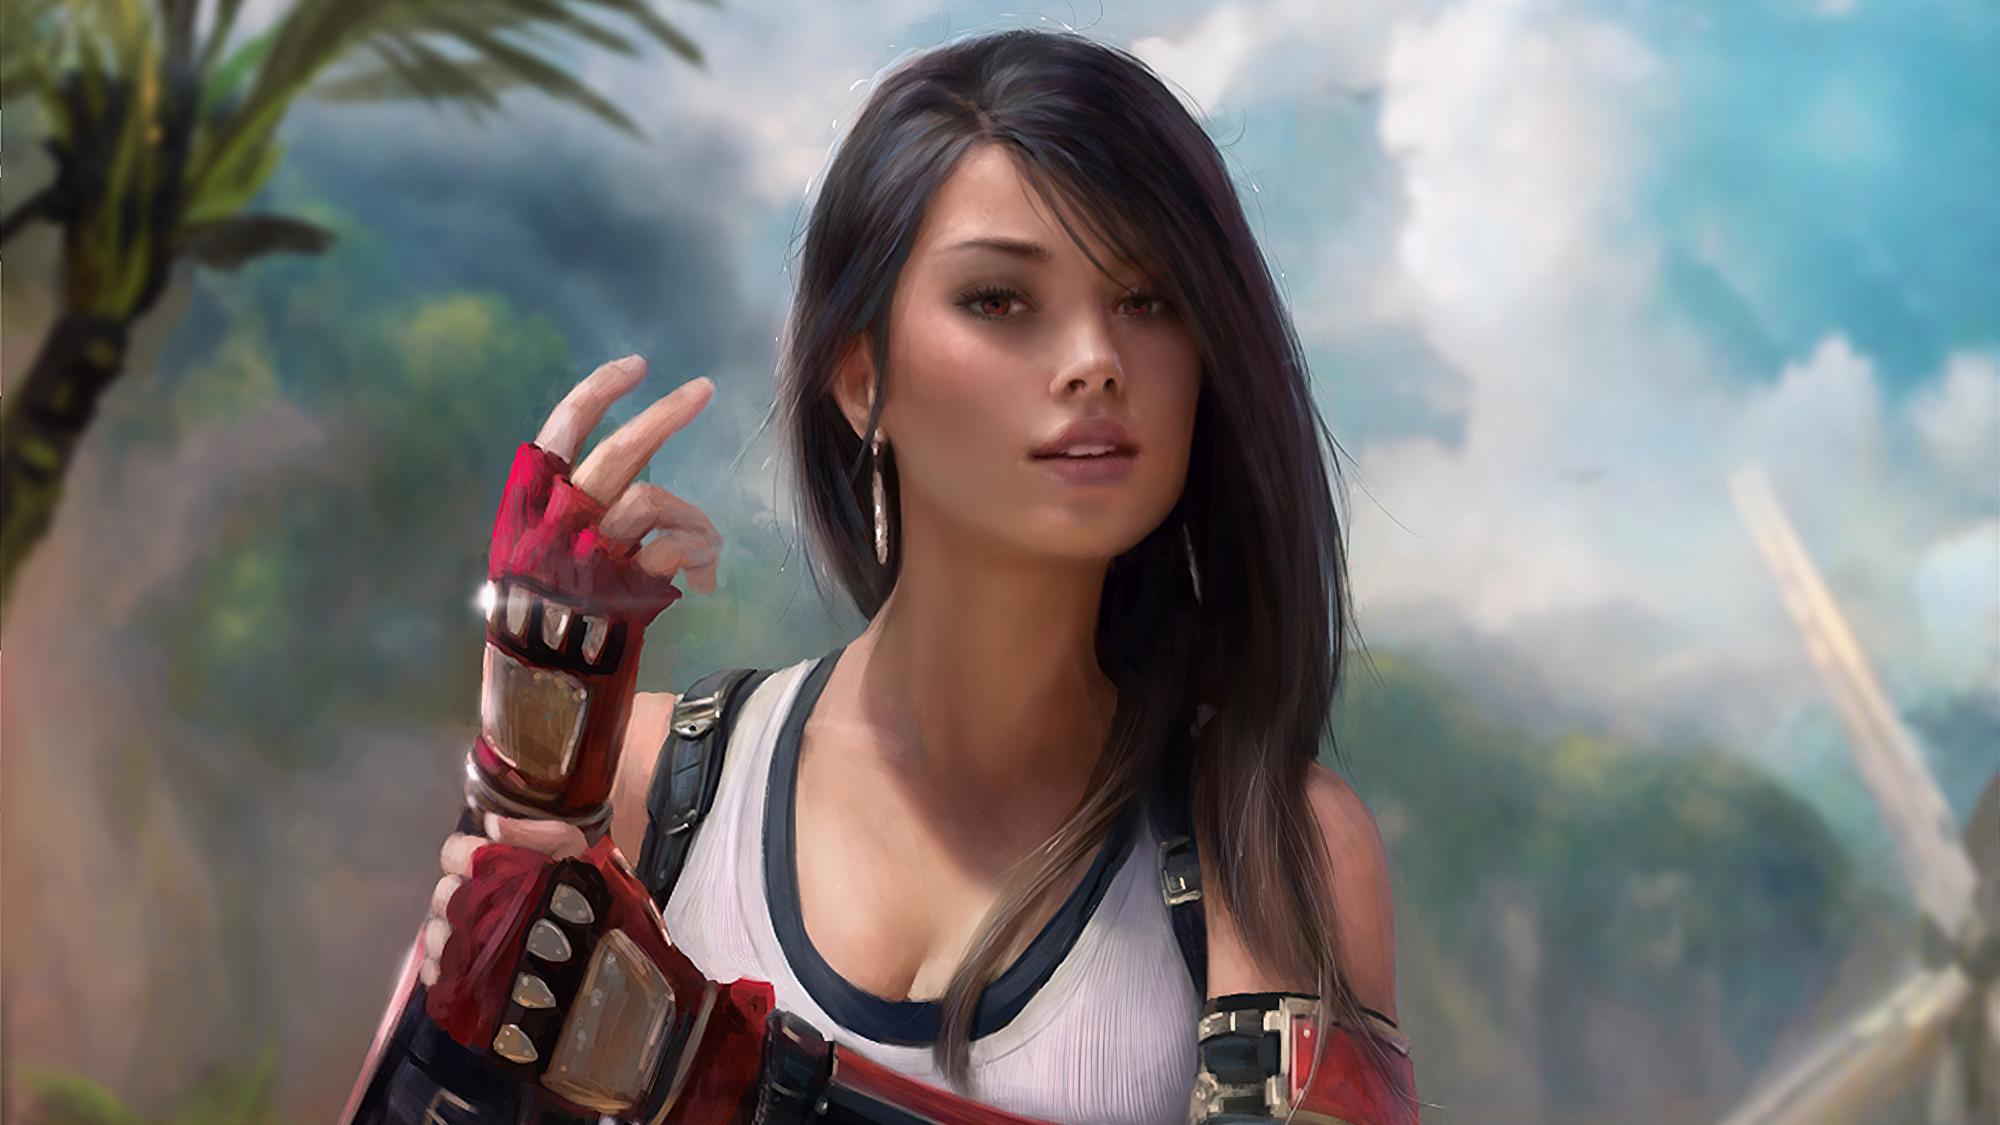 2560x1600 Tifa Lockhart Final Fantasy Game Artwork 2560x1600